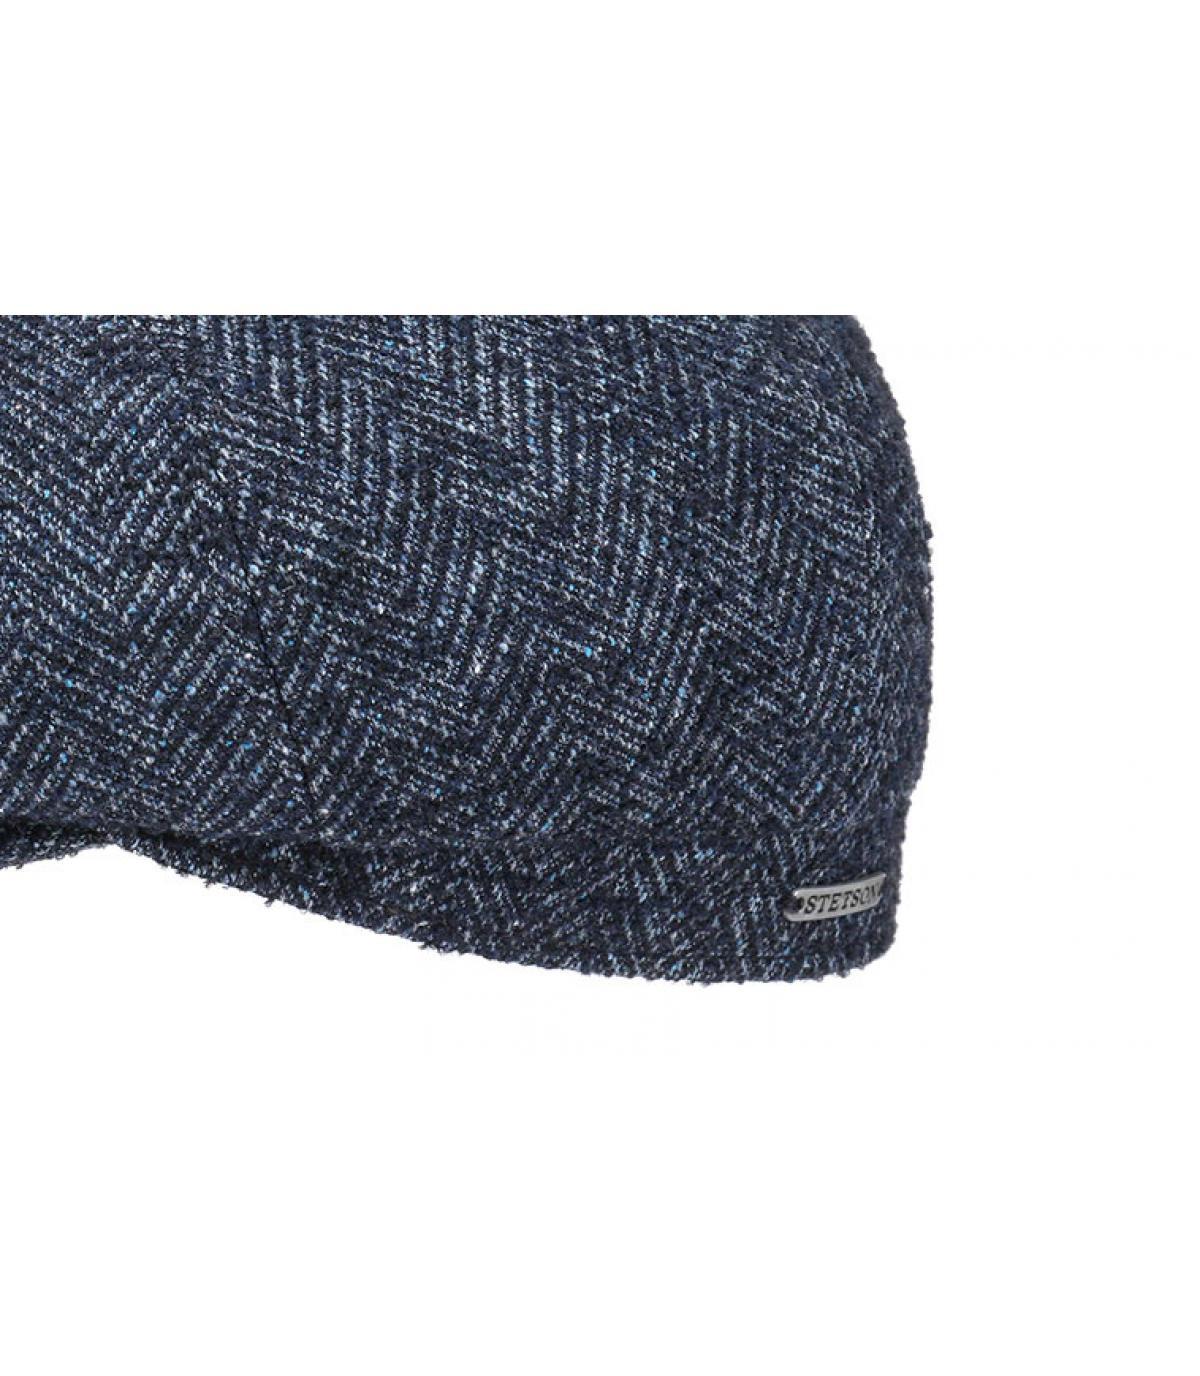 Detalles Hatteras Virgin Wool blue herringbone imagen 3